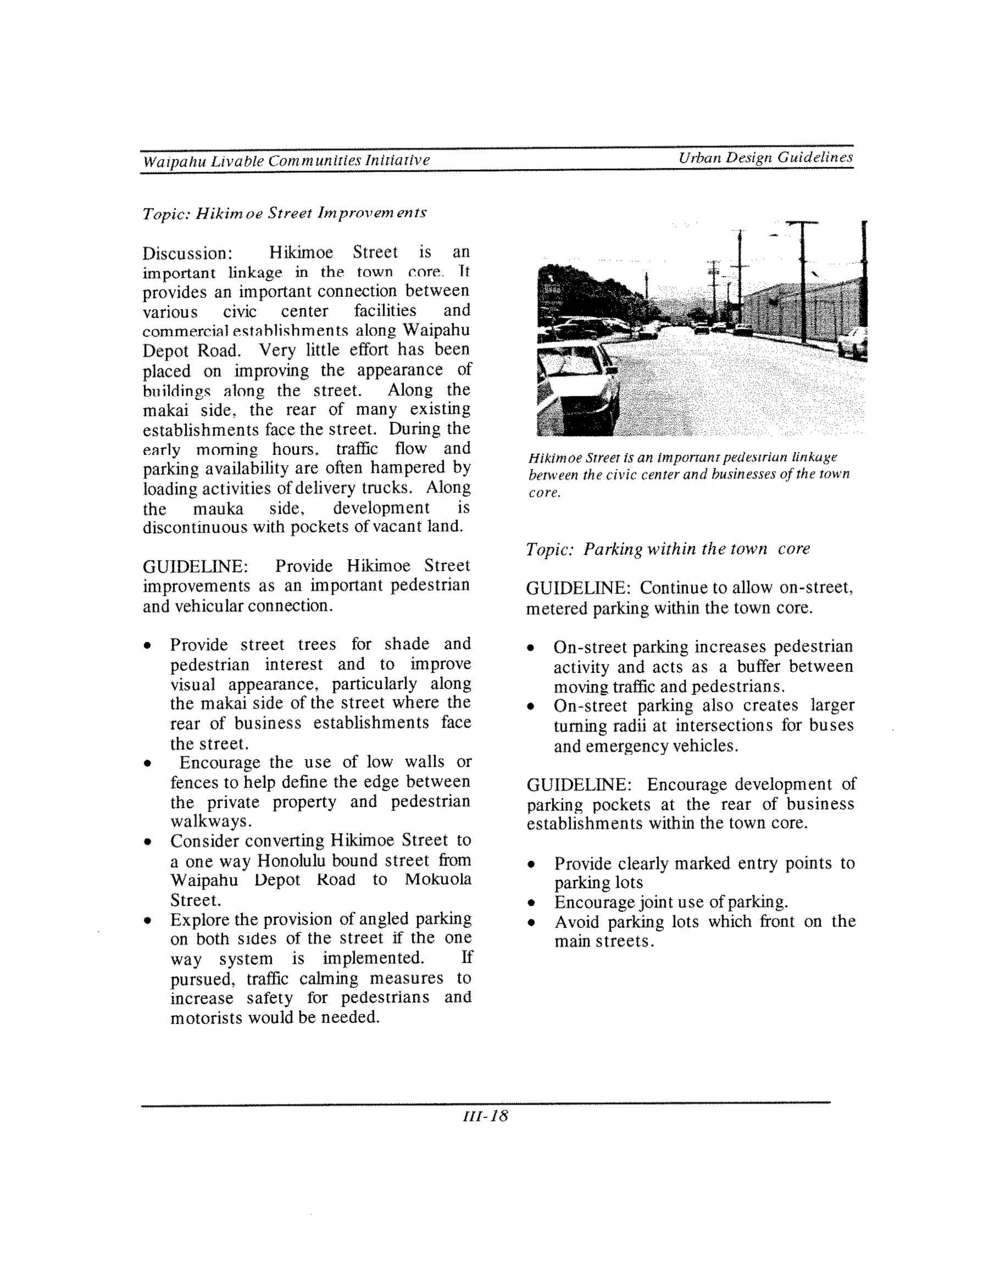 160531_WaipahuLivableCommunities(1998)_Page_108.jpg